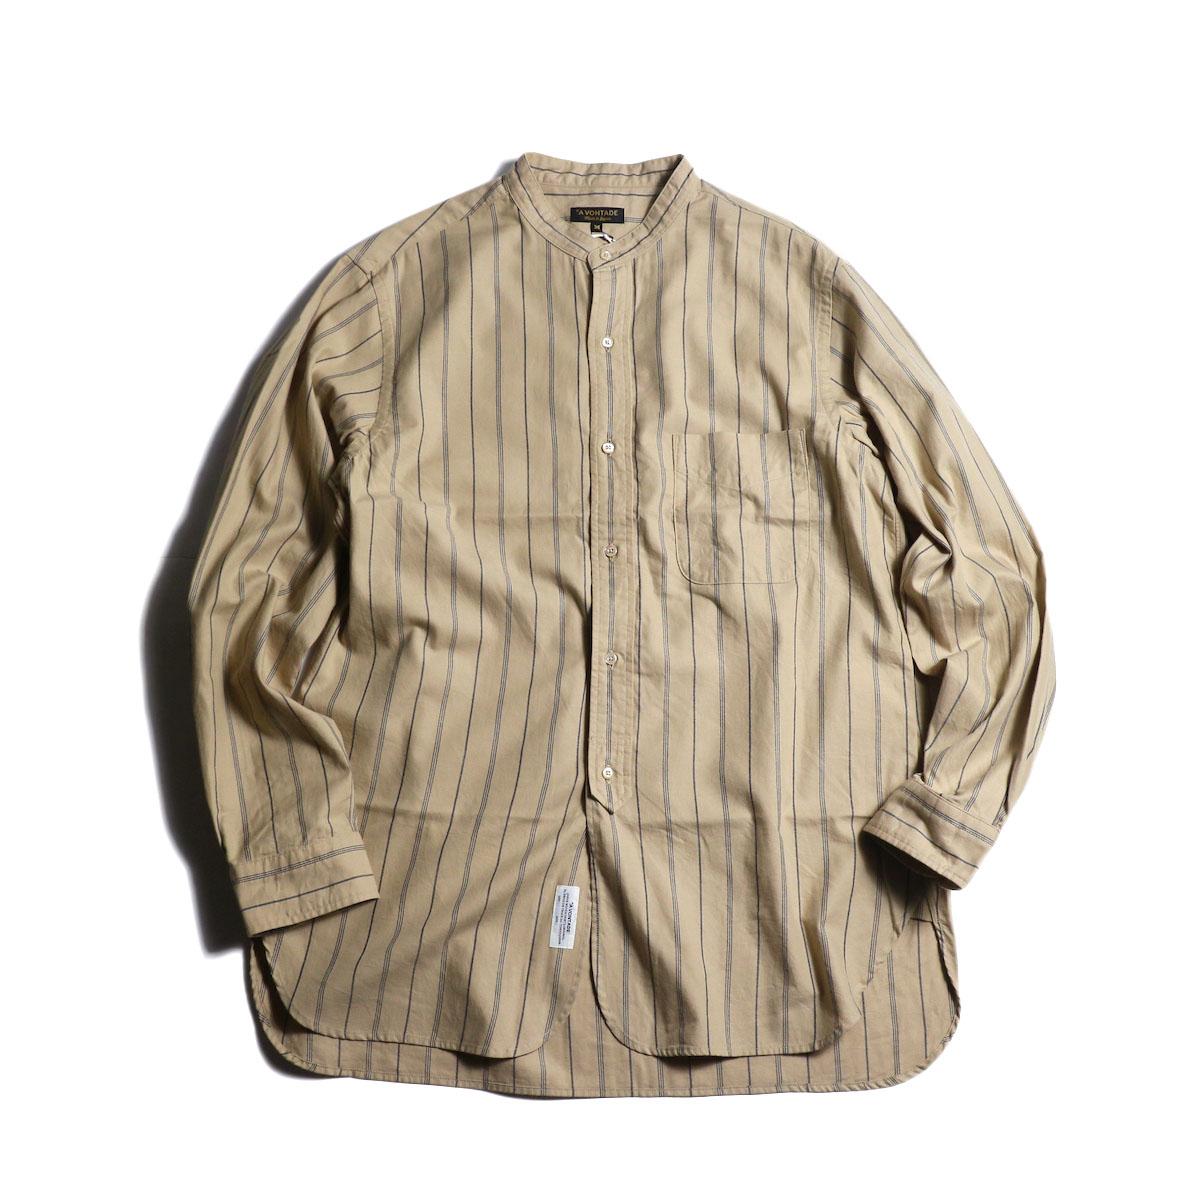 A VONTADE / Banded Collar Shirts (Beige Stripe)